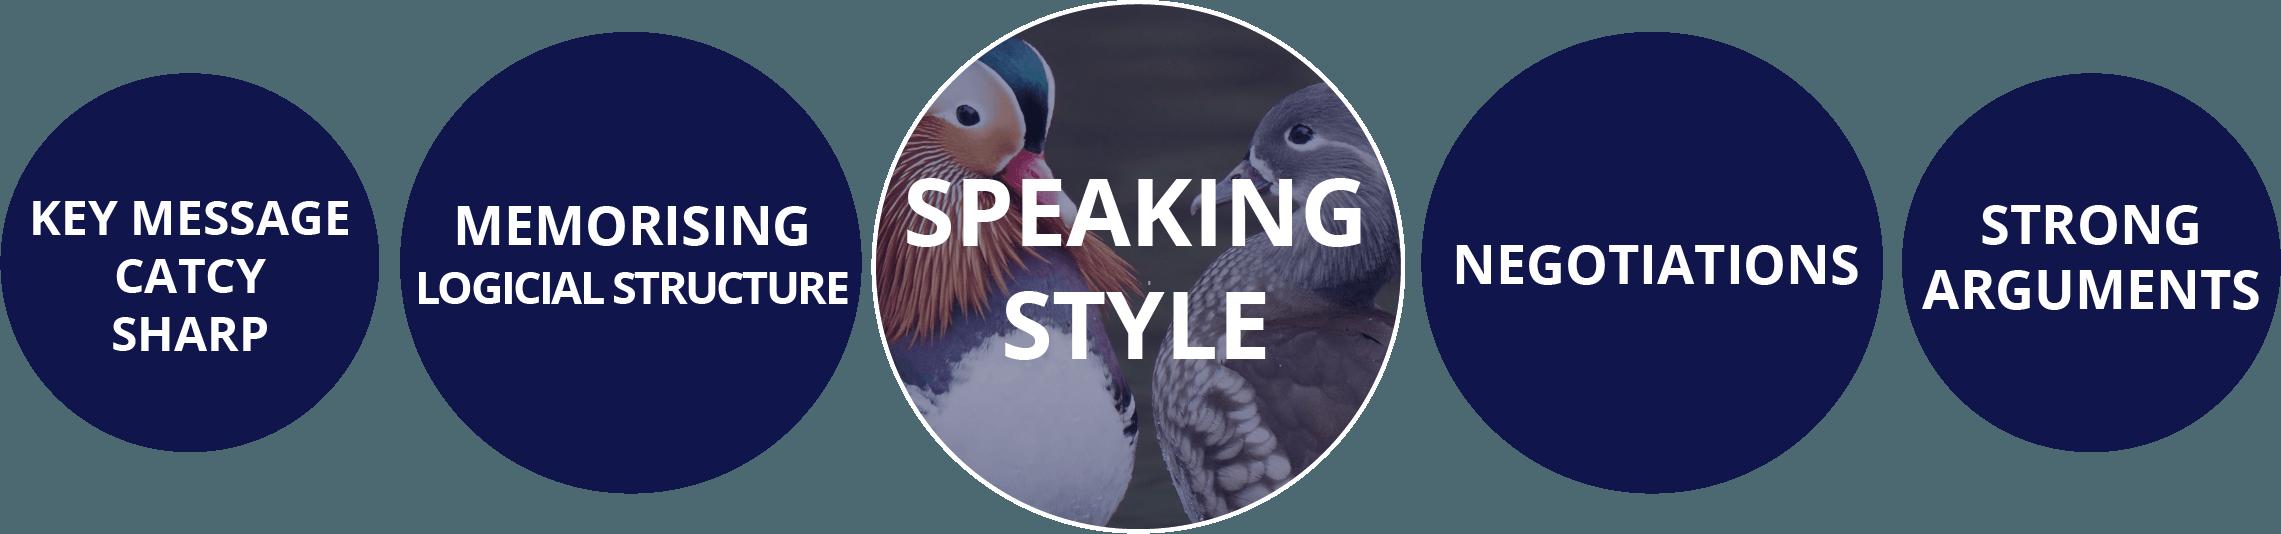 speaking_style_newArtboard 1-8.png